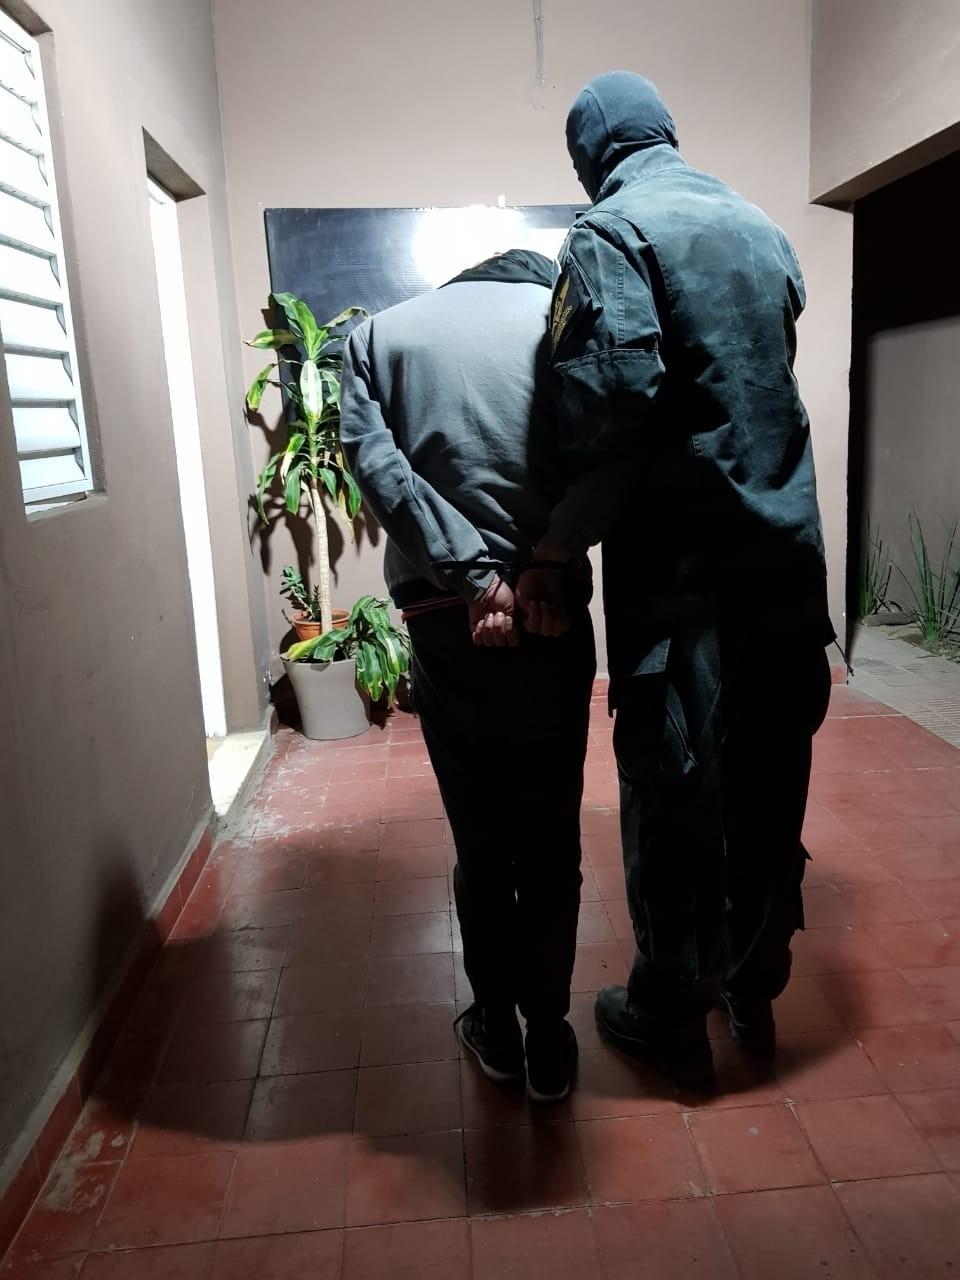 FPA detuvo a dos dealers de drogas que trabajaban en el centro de Córdoba